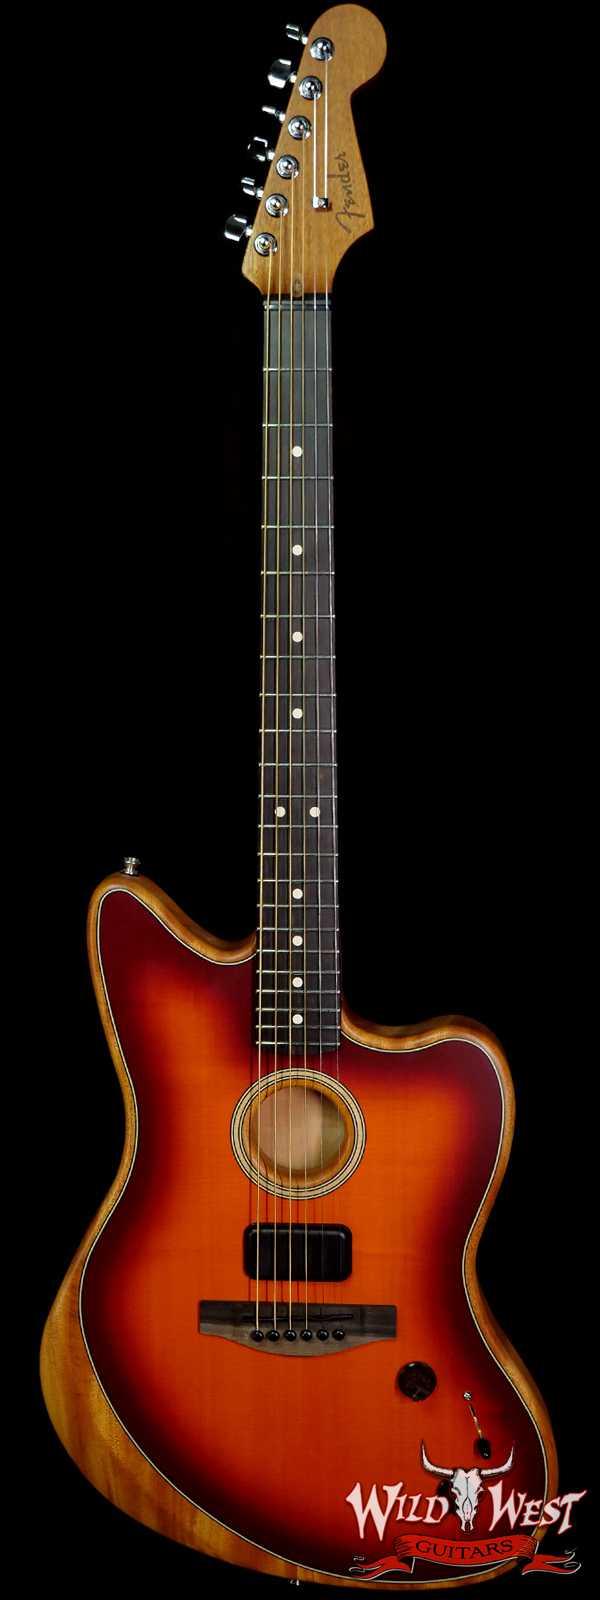 Fender American Acoustasonic Jazzmaster Ebony Fingerboard Tobacco Sunburst